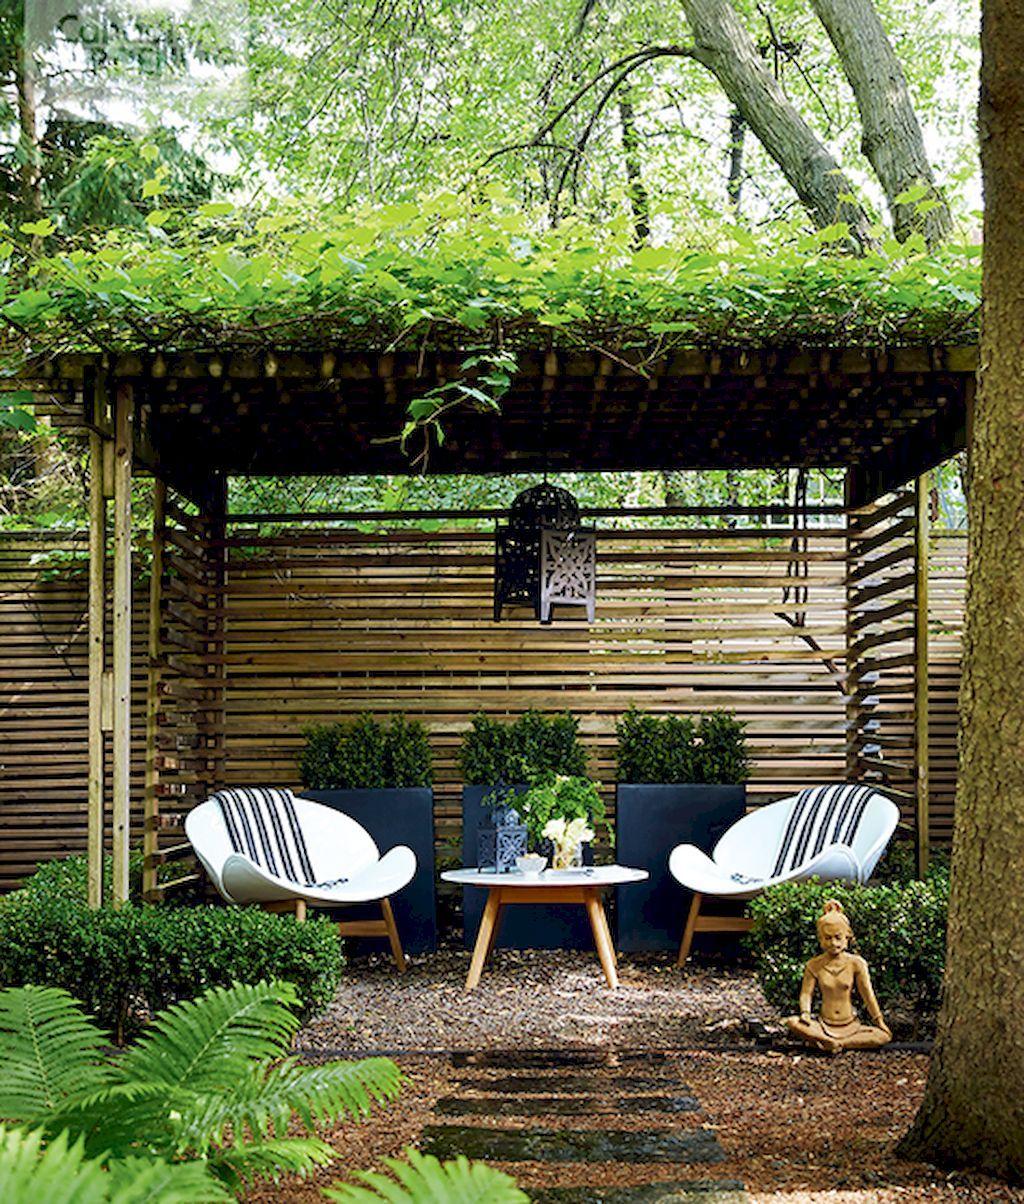 Gardening Ideas On A Budget: 70 Creative DIY Backyard Privacy Ideas On A Budget